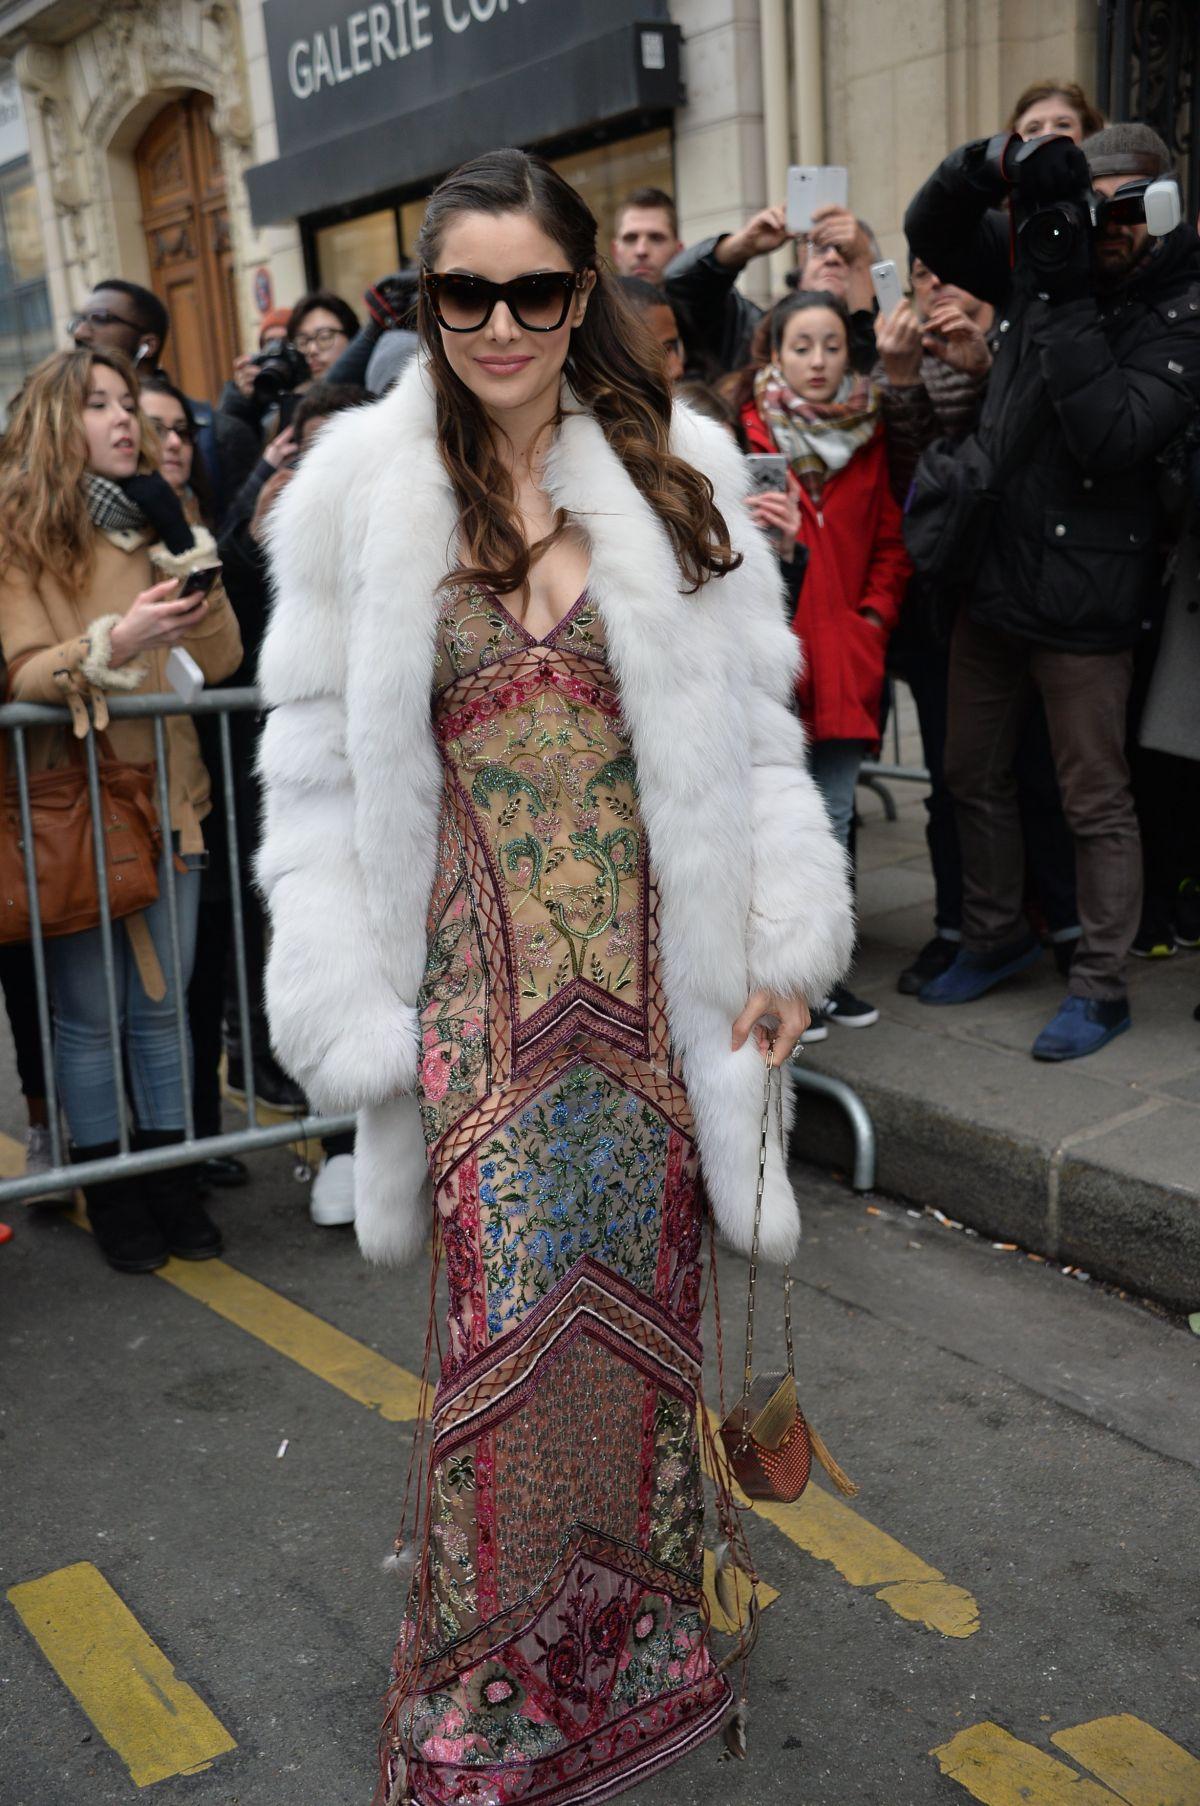 DEBORAH VALDEZ HUNG at Jean-paul Gaultier Fashion Show at Pais Fashion Week 01/25/2017